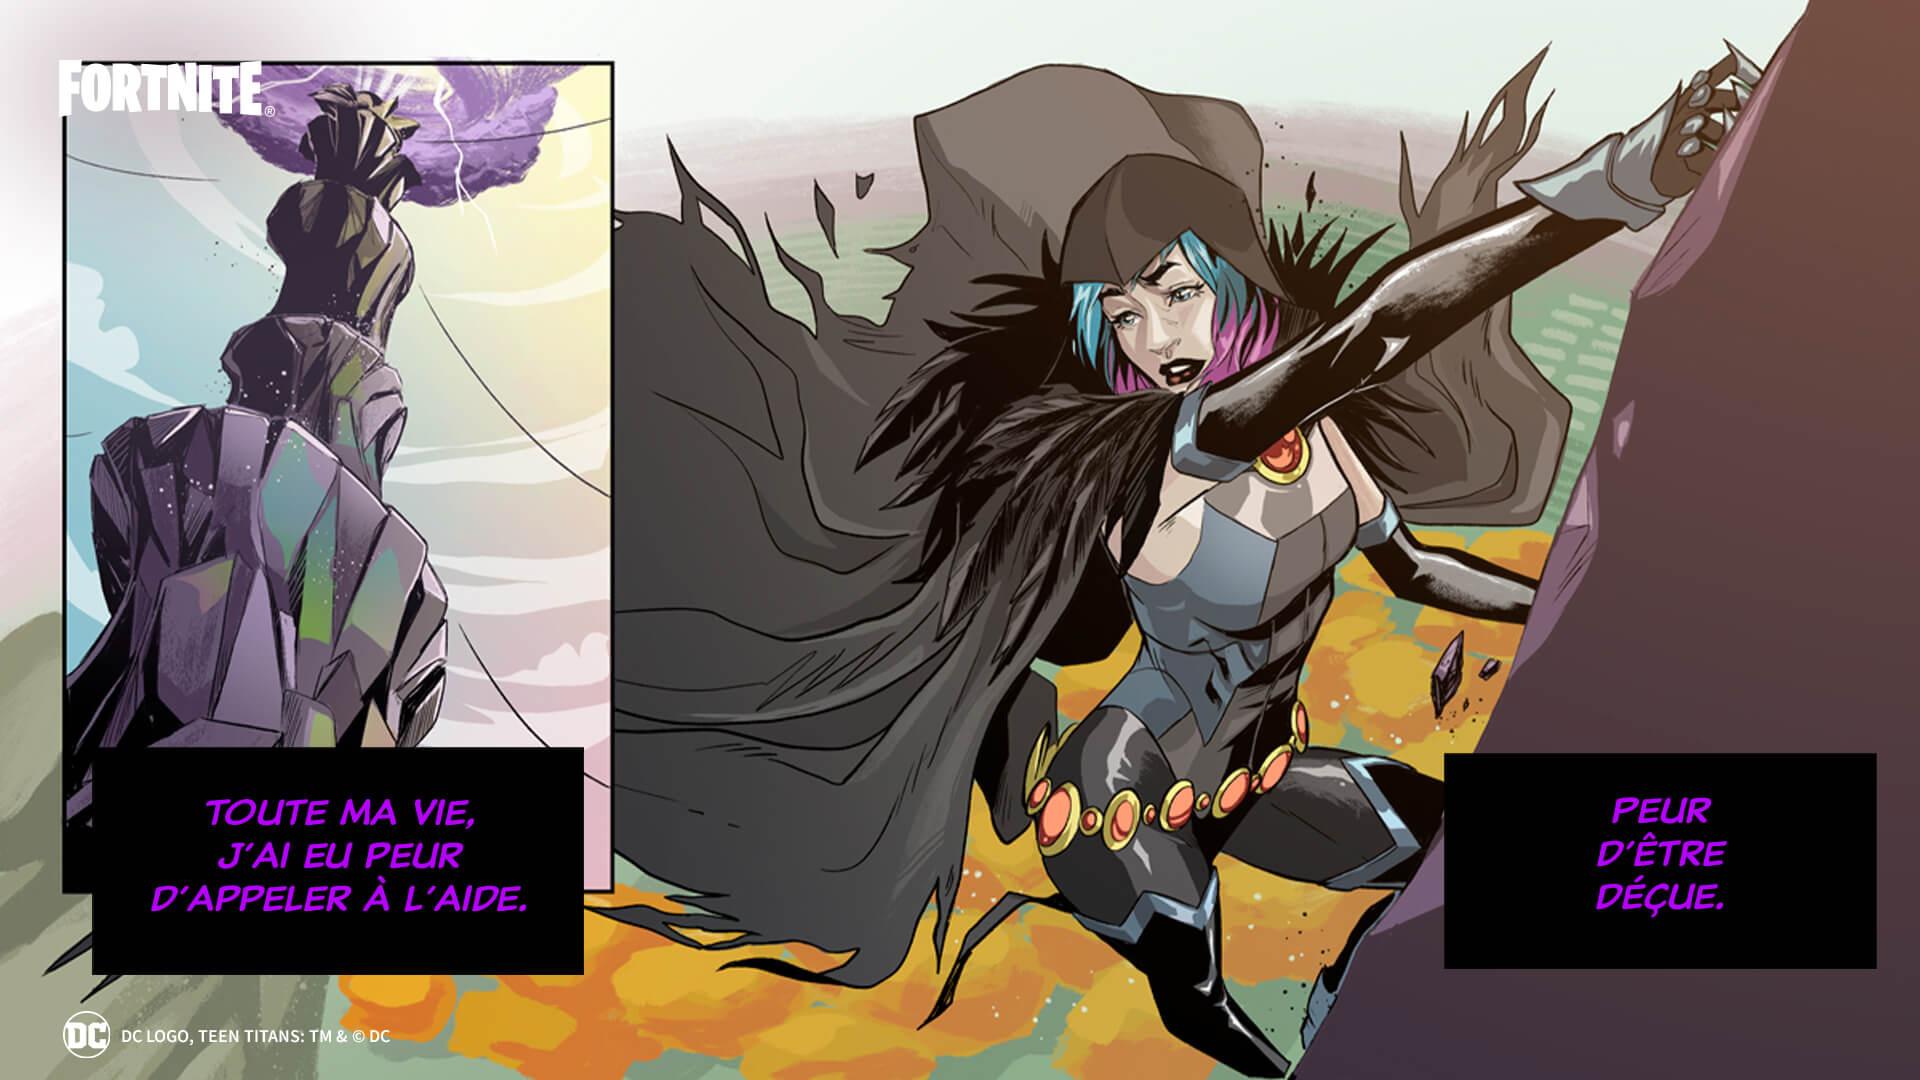 FR Raven BeastBoy S16 01 Social 1920x1080 1